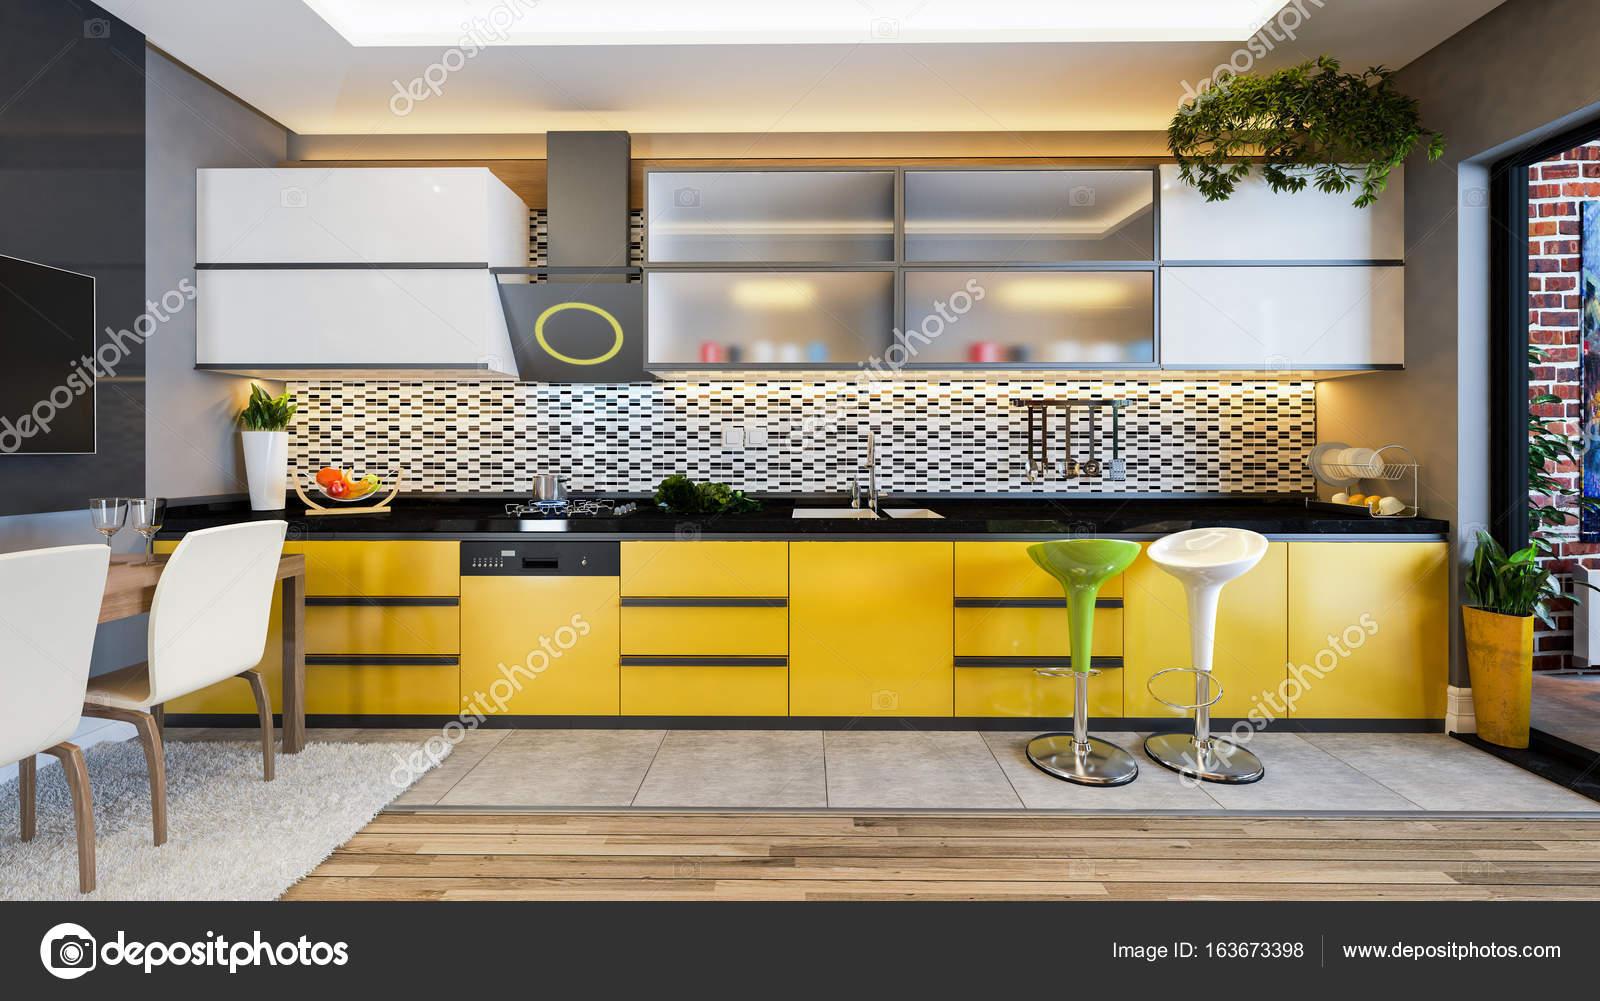 Gelbe Farbe Kuche Design Dekor Idee Stockfoto C Sseven 163673398